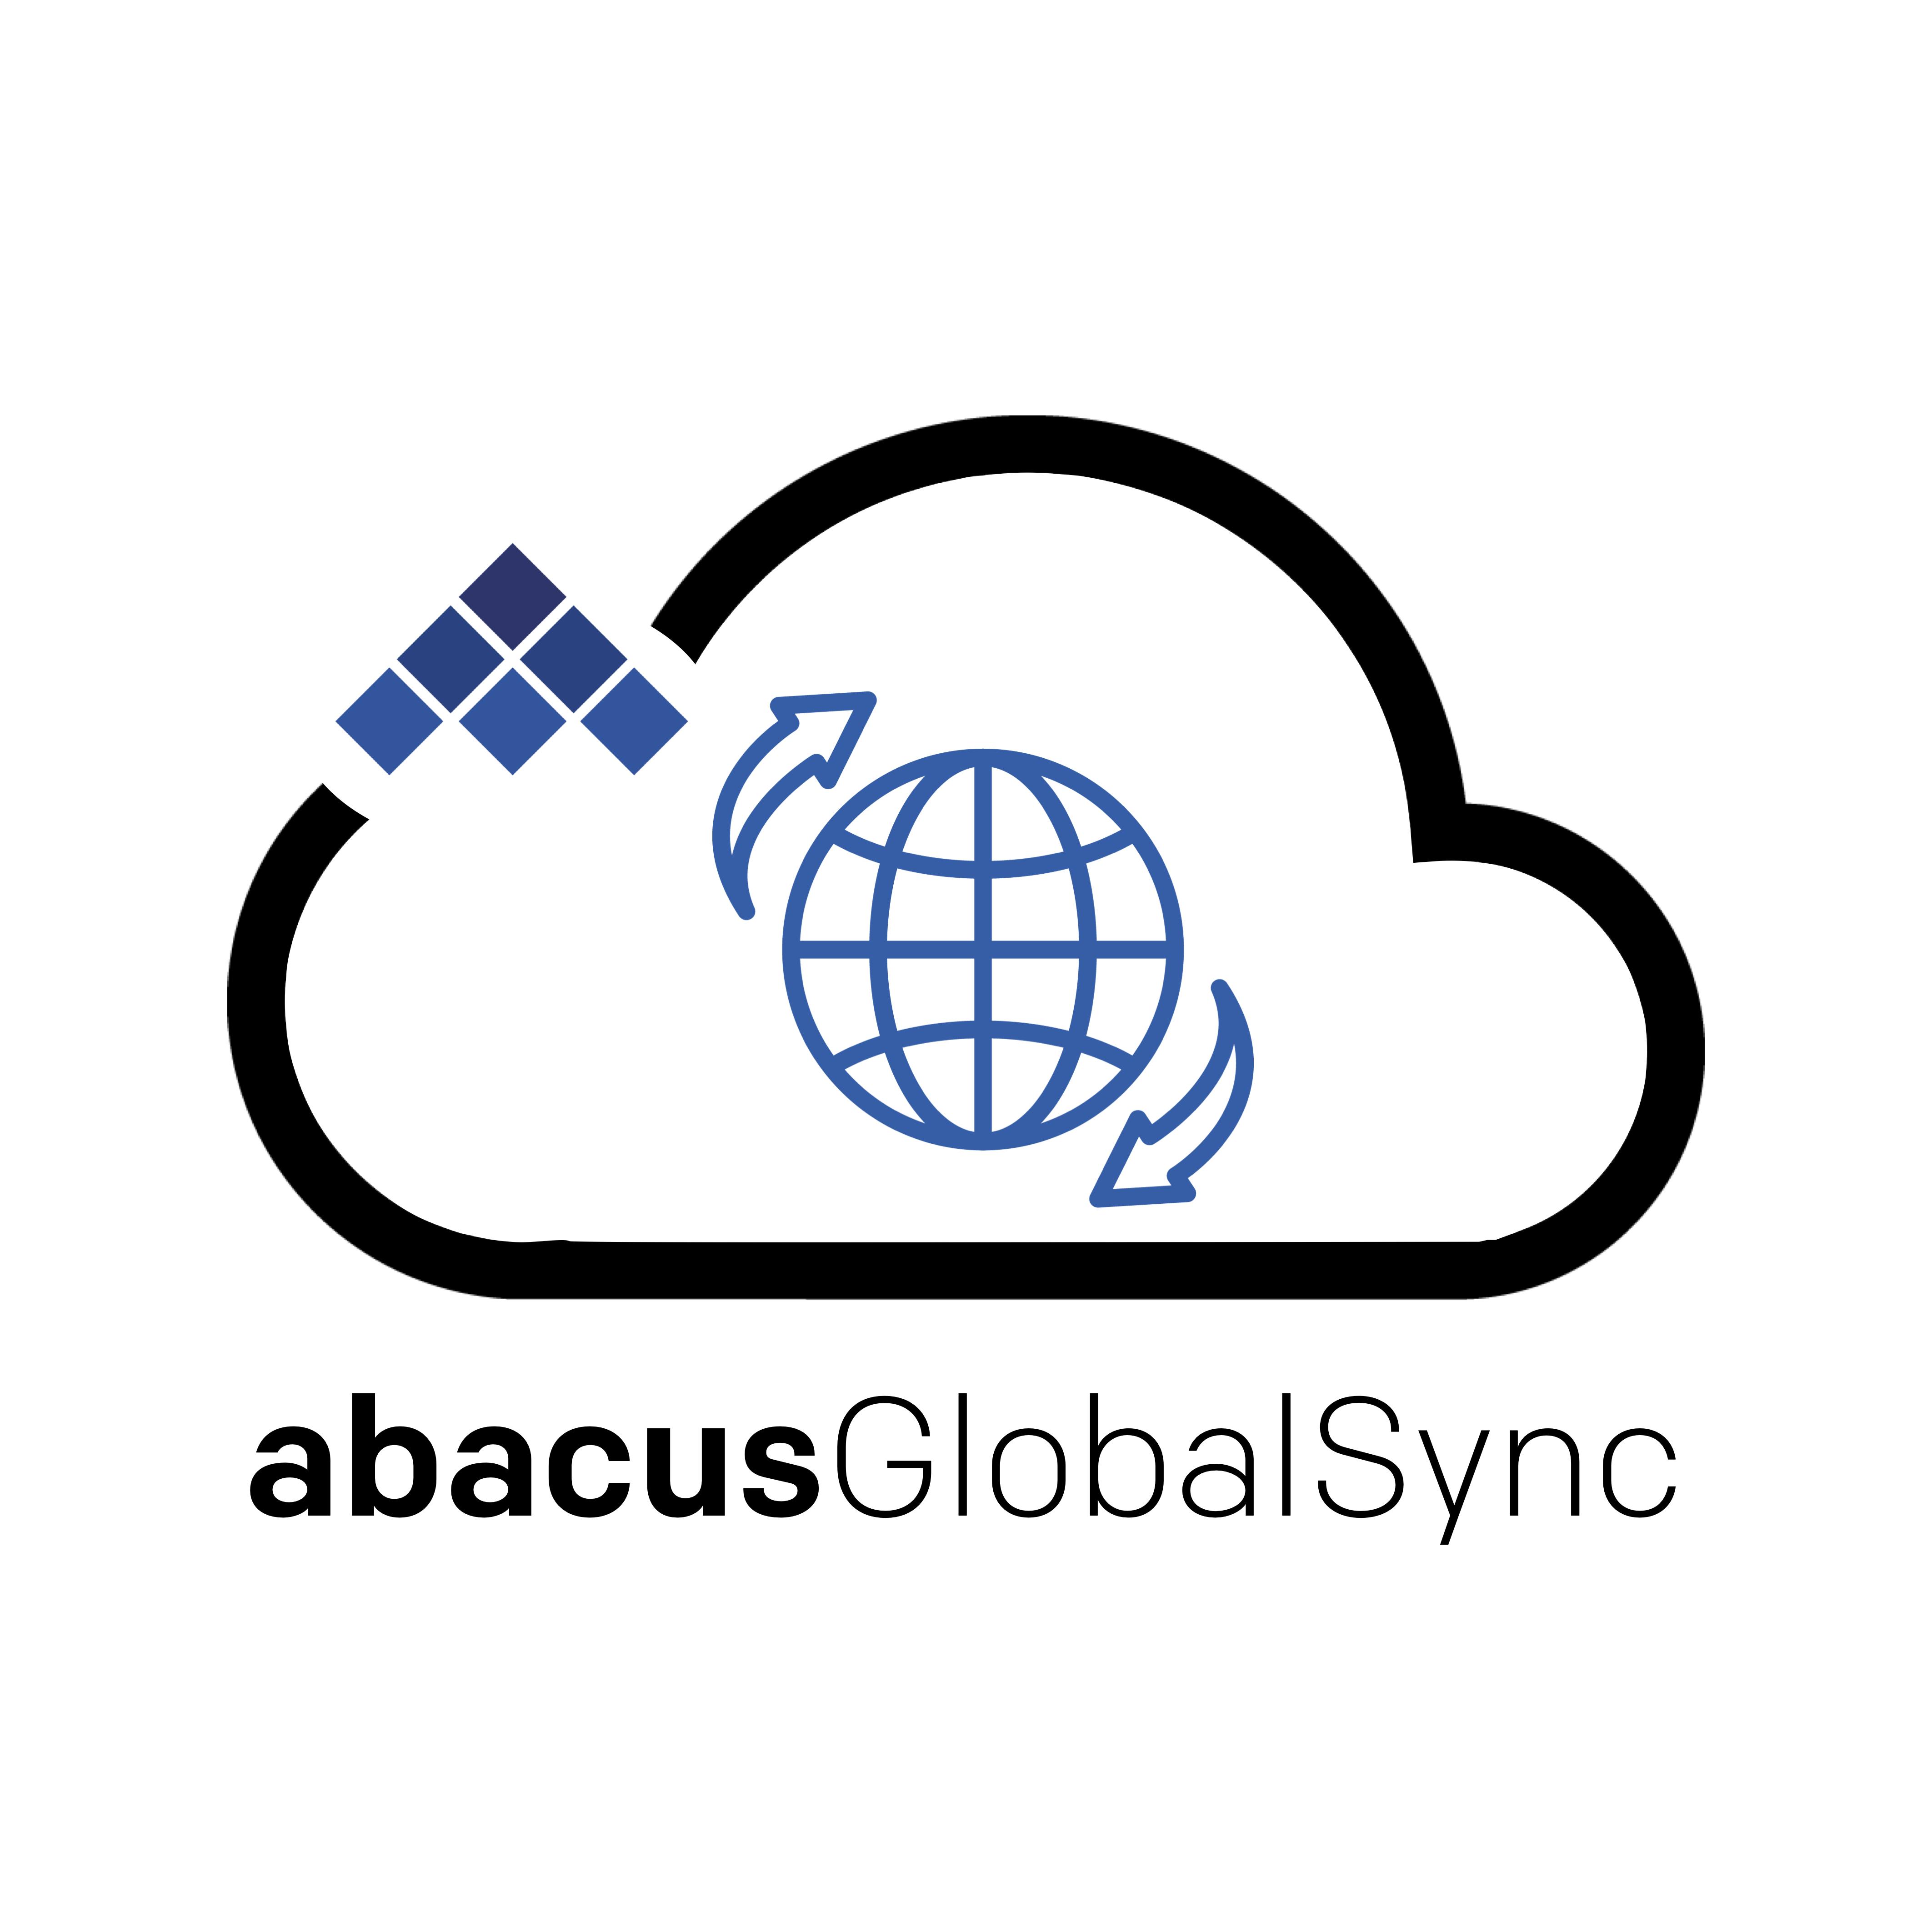 abacusGlobalSync